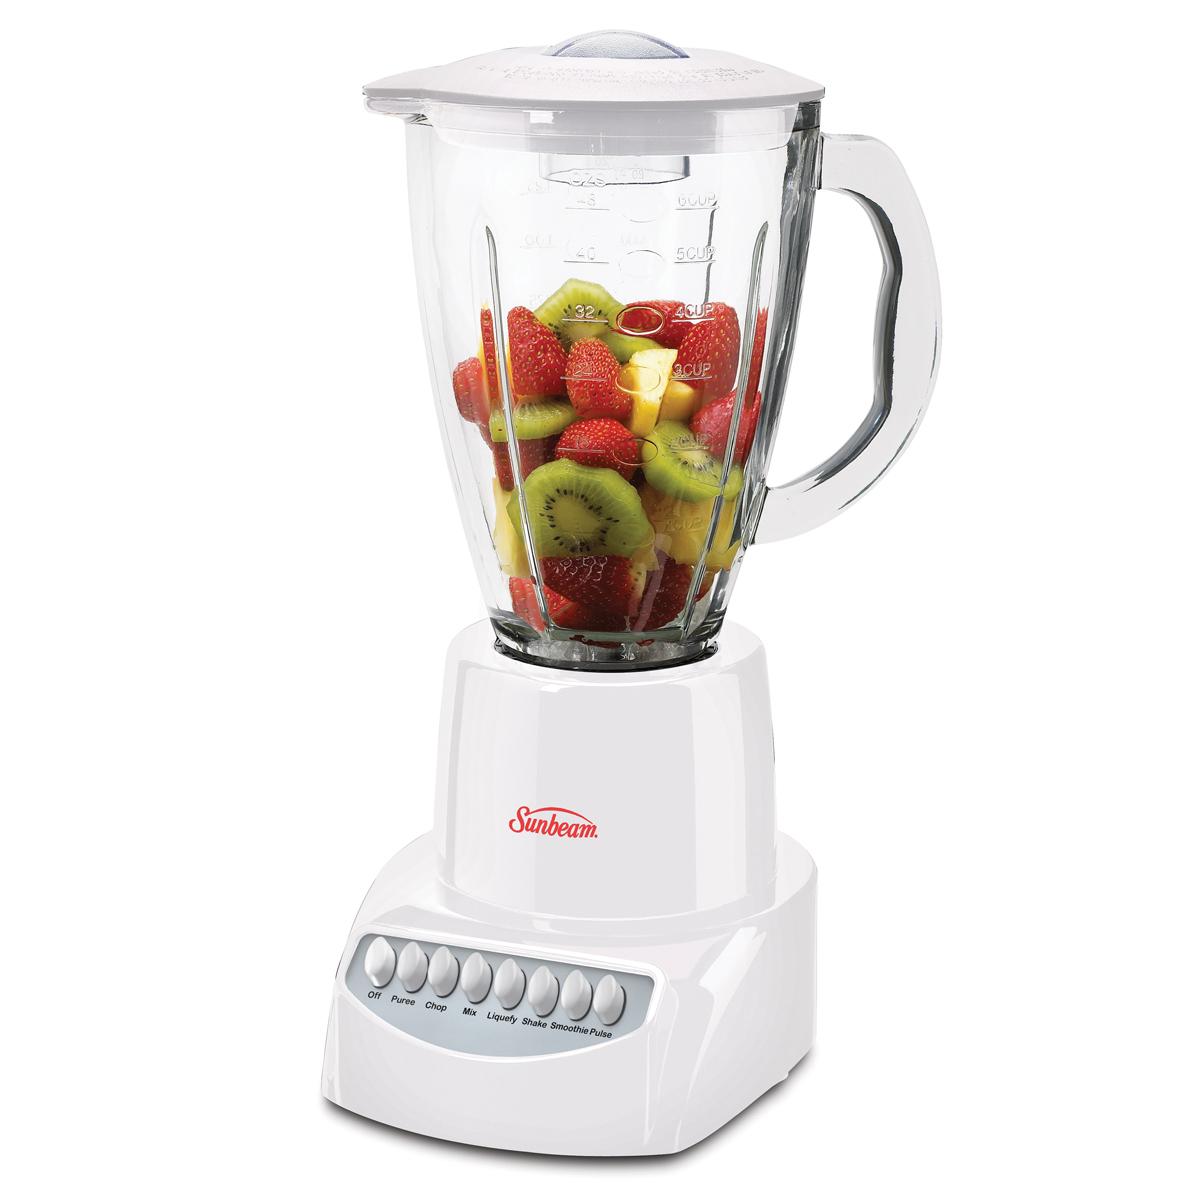 Kitchen Blenders: Sunbeam® 350 Watt 6 Speed Stand Blender, White BLSBX3-W00